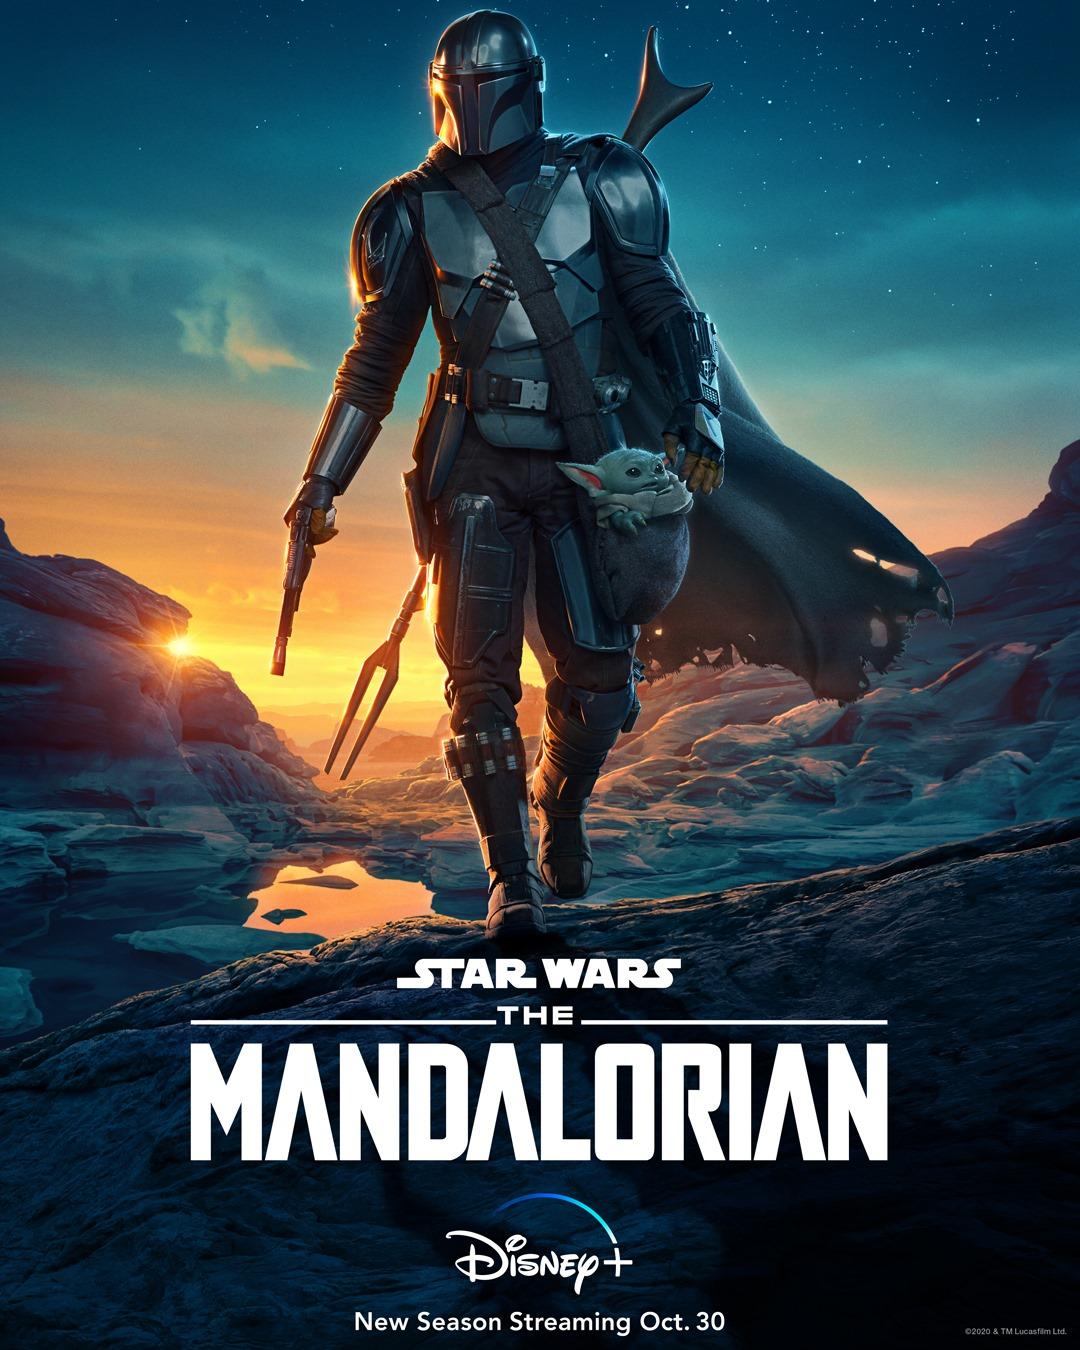 The Mandalorian Disney+ Poster